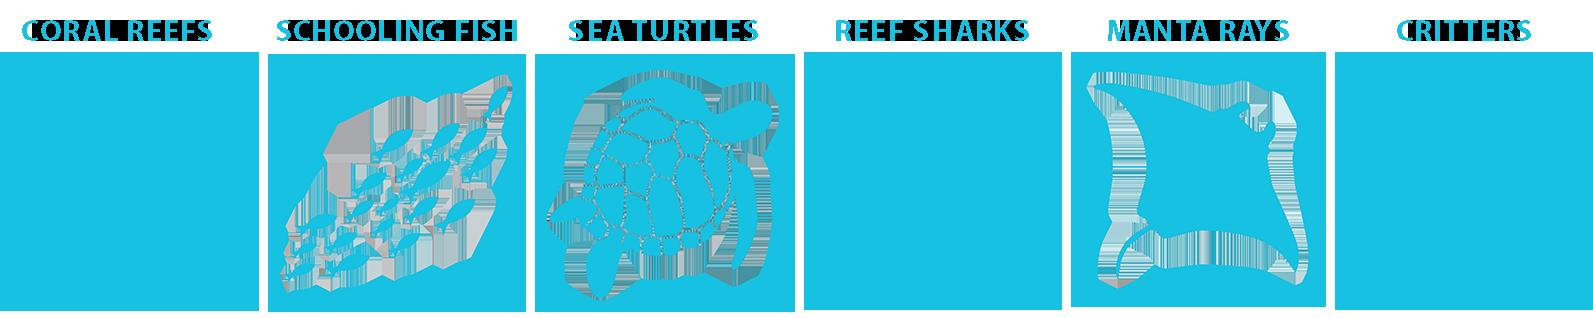 Komodo marine life guide